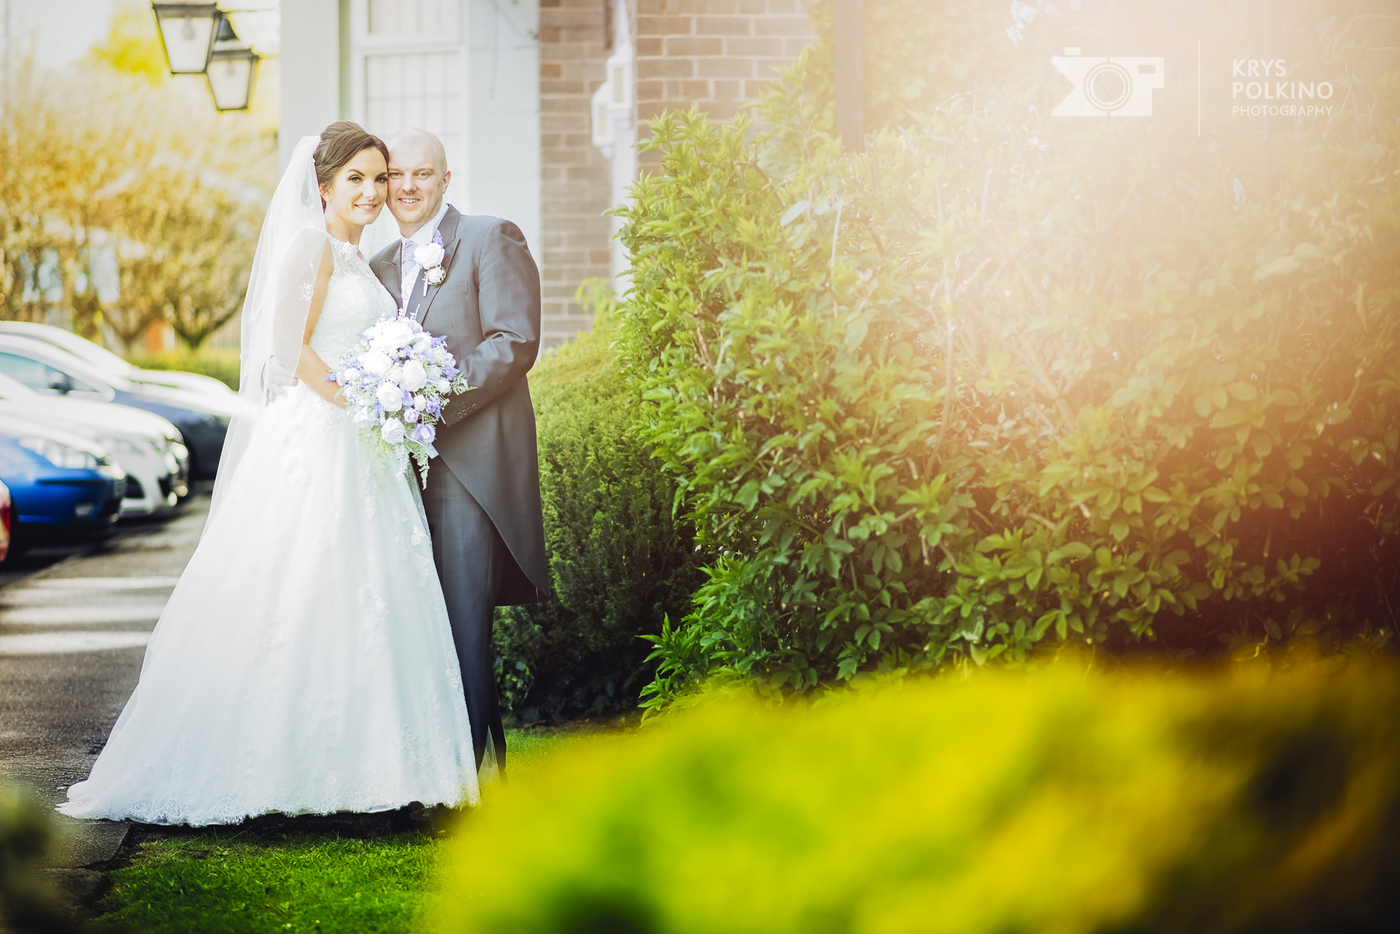 Wedding at the Park, Liverpool. Sarah & Gareth.